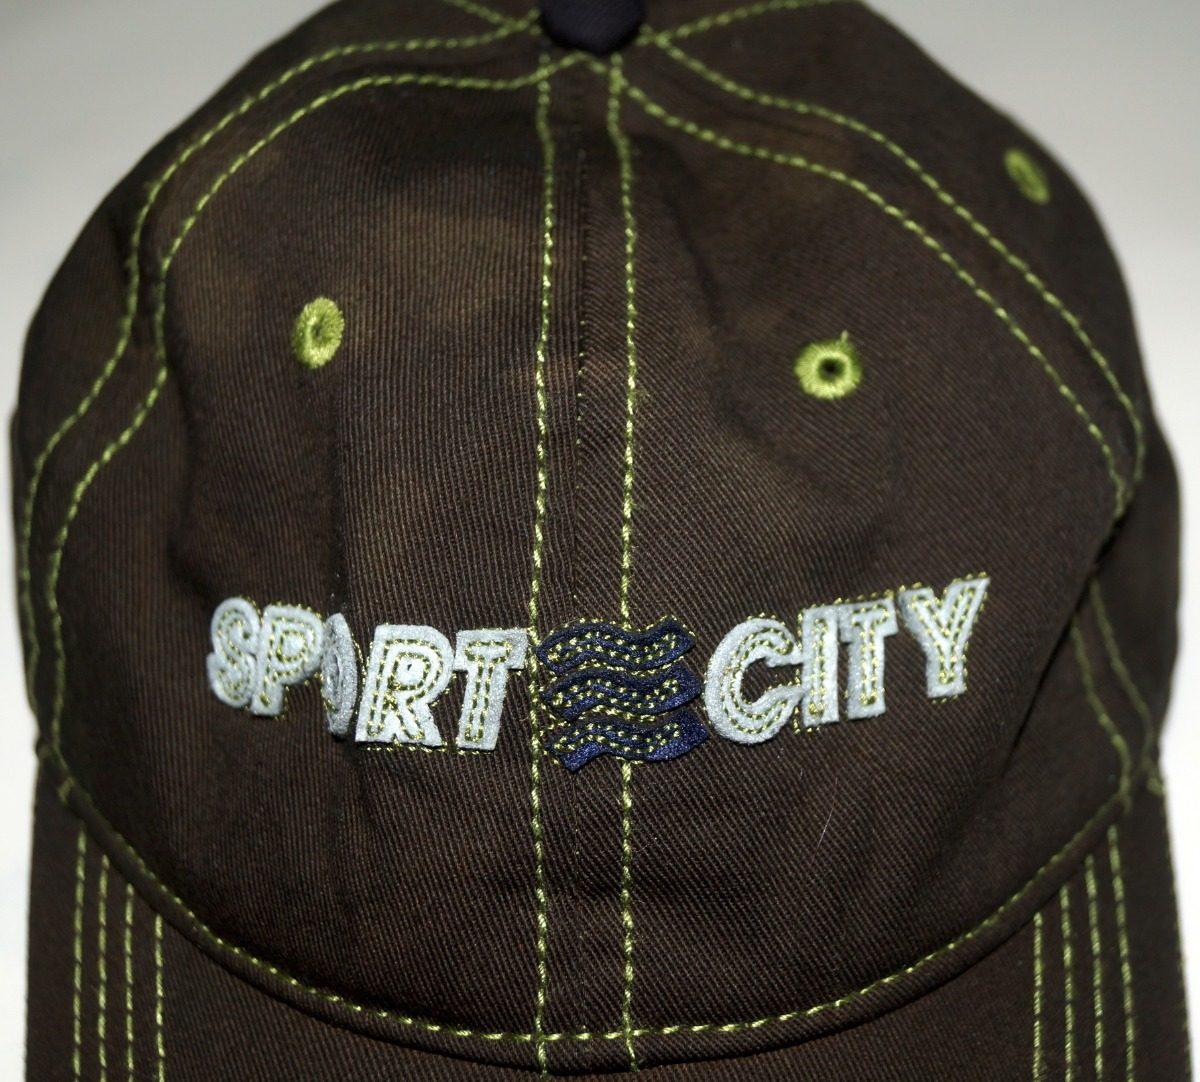 Lote De 2 Gorras Sport City Y Wild Planet Envio Gratis -   370.00 en ... d4d4ceef4d1